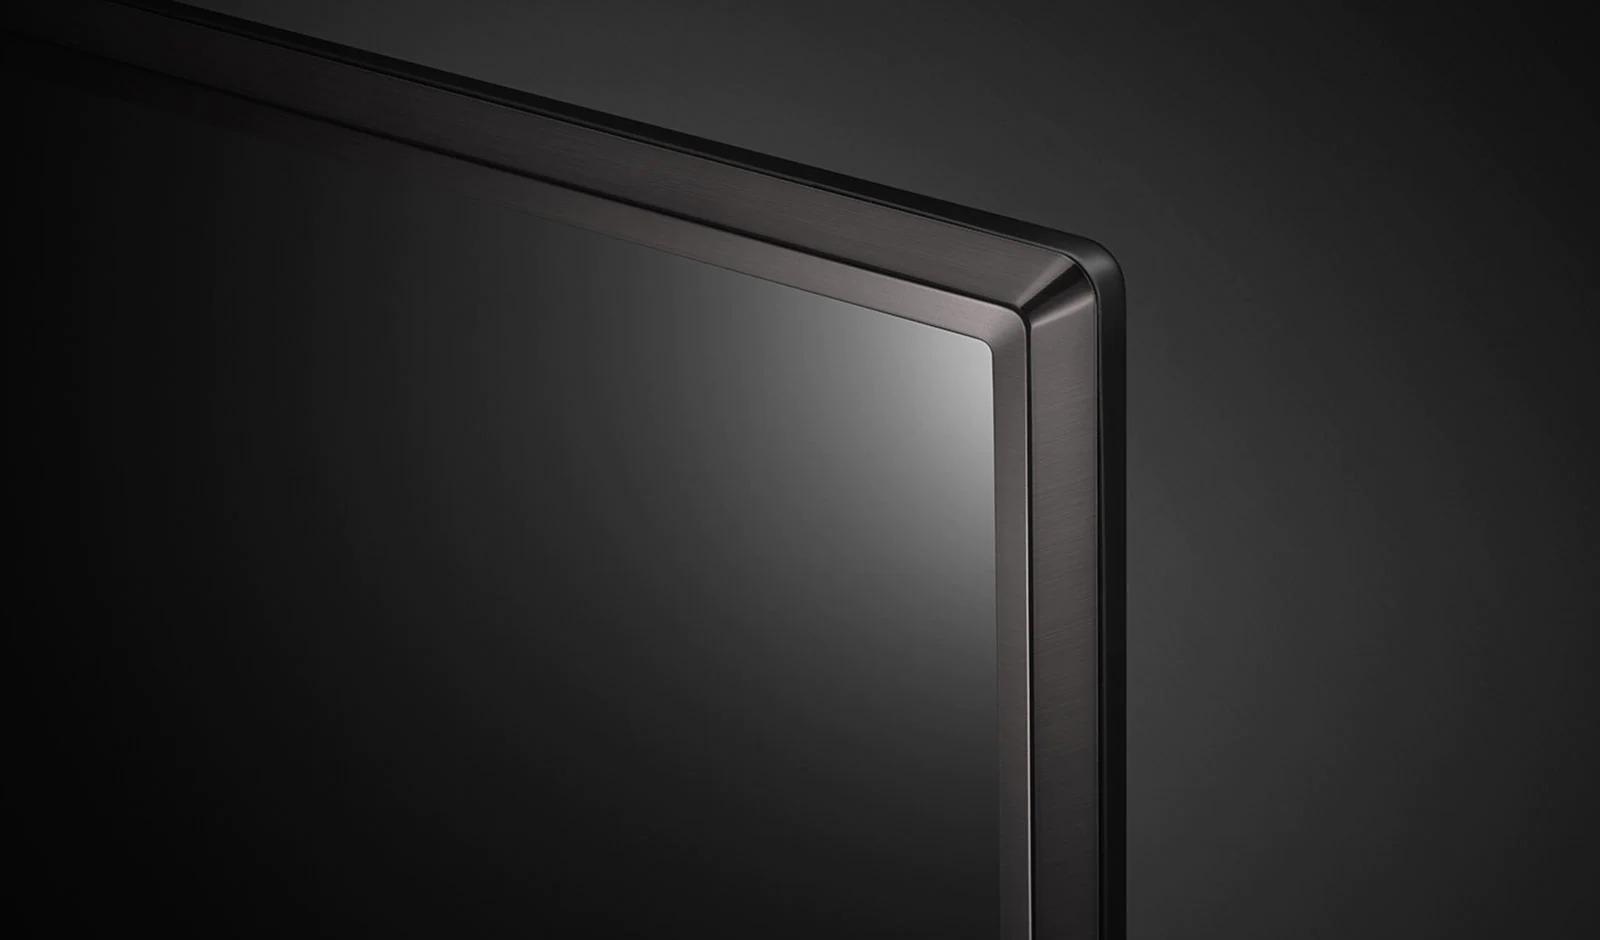 LG (43LJ554T) 43 (109cm) Full HD Smart TV